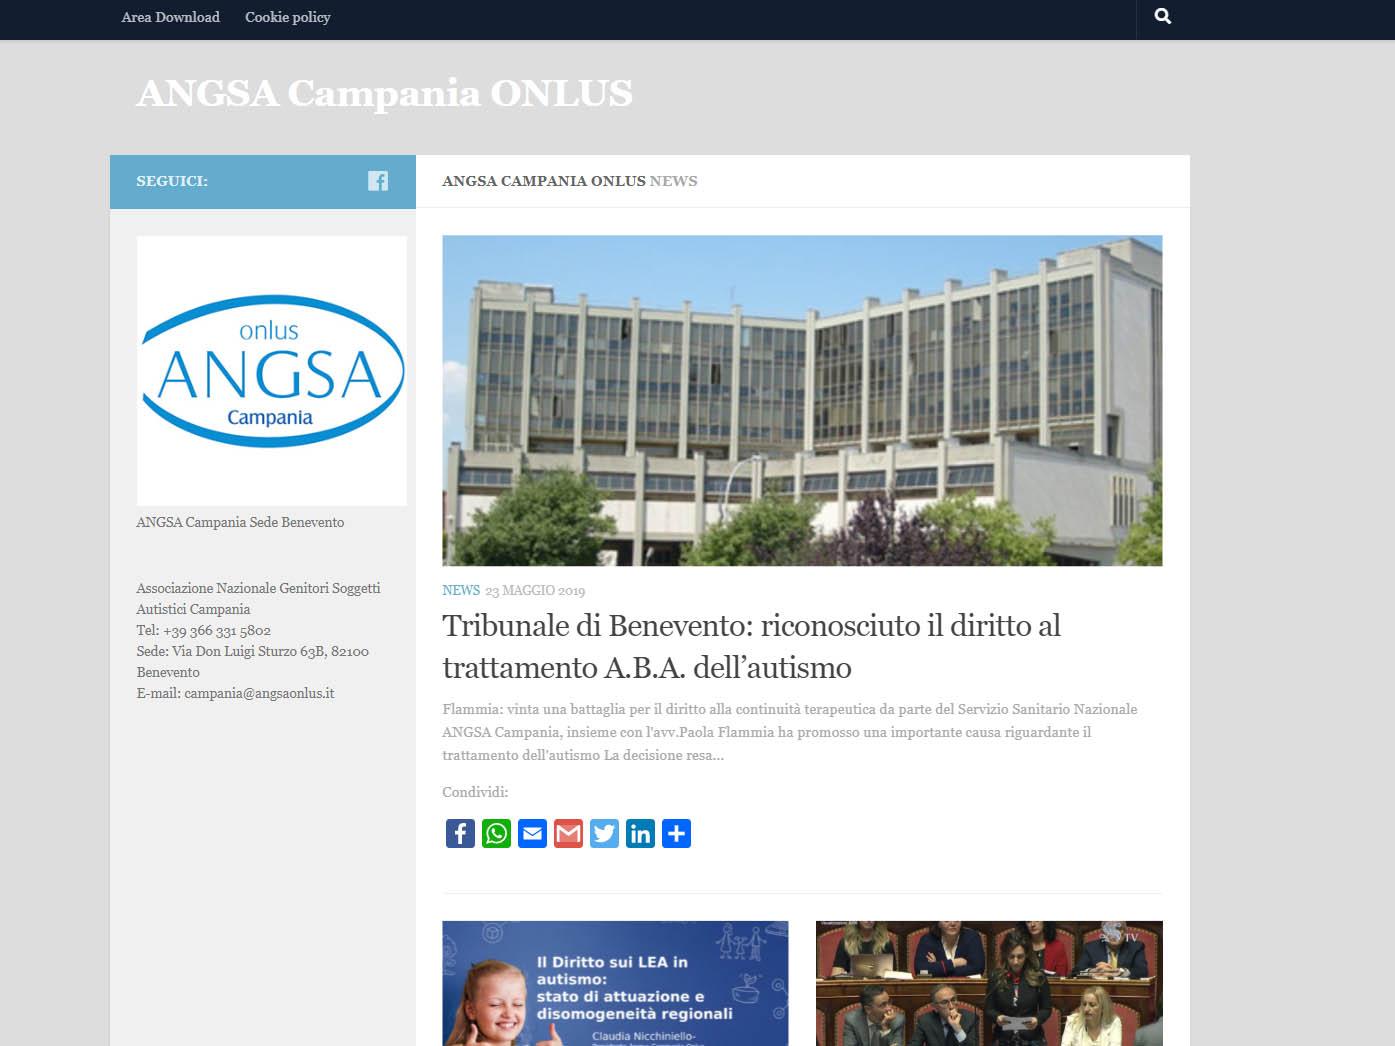 Sito web ANGSA Campania